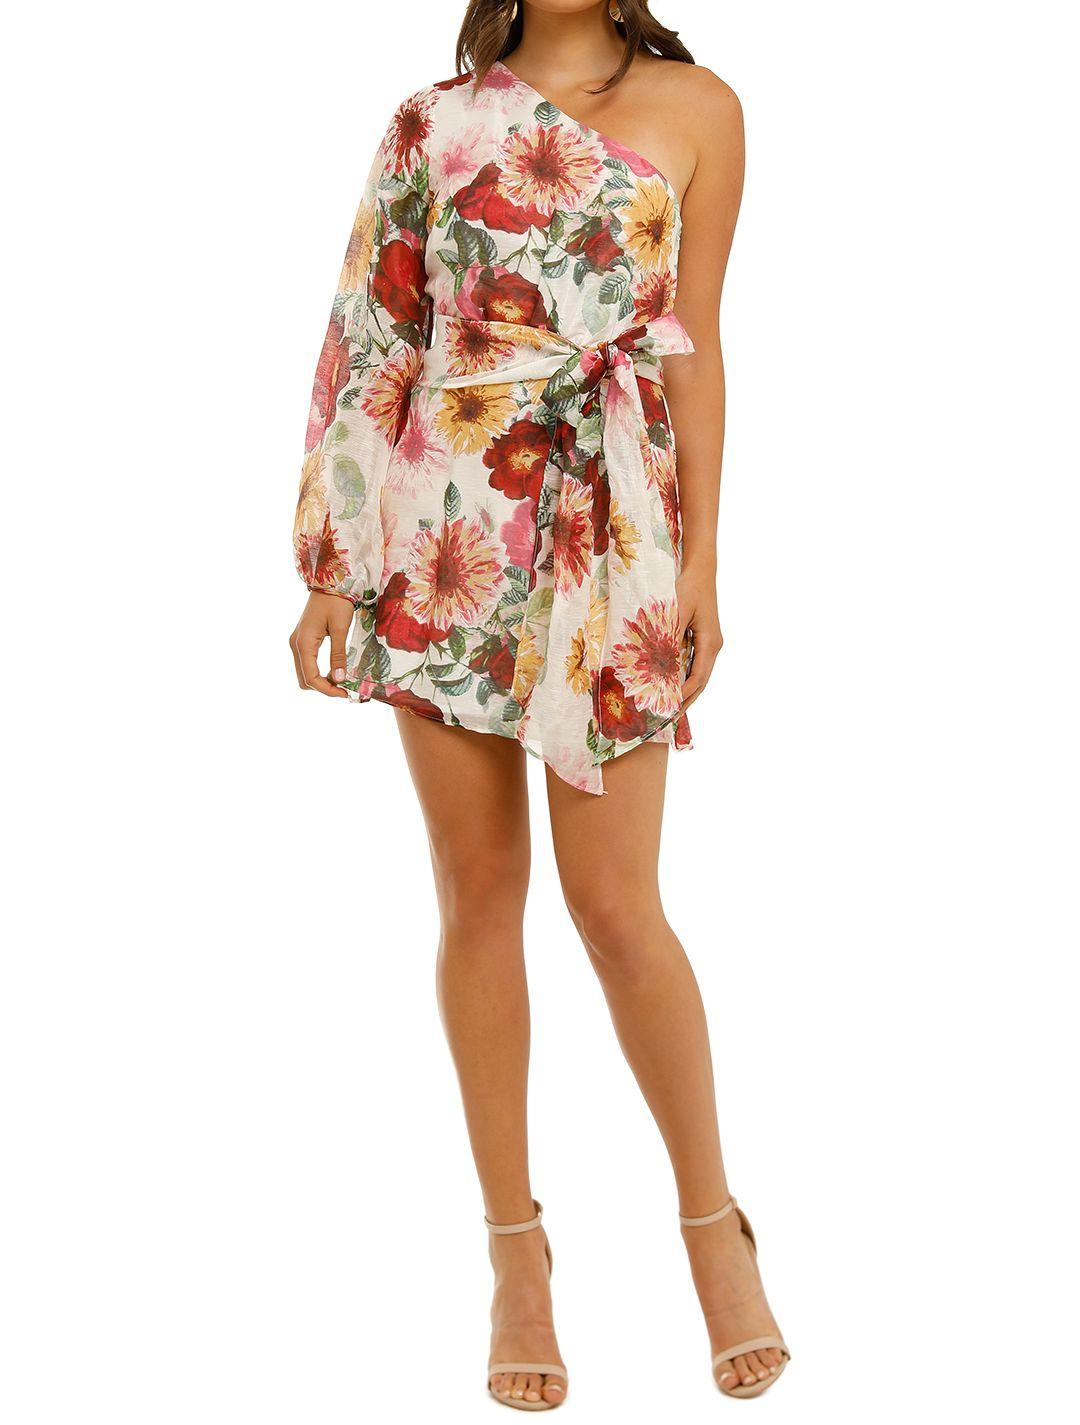 Talulah-Garland-Mini-Dress-Amelie-Floral-Print-Front